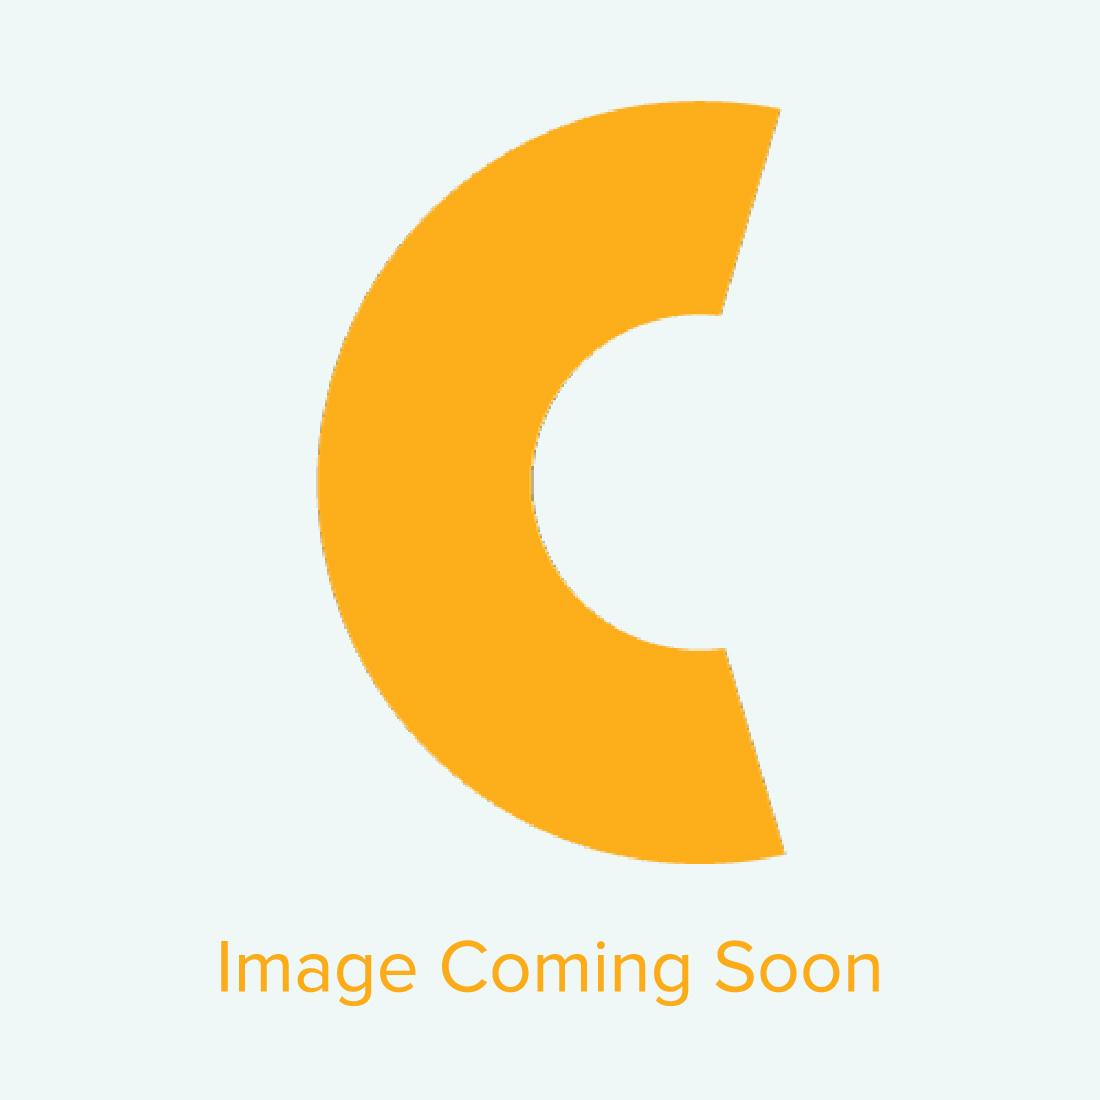 ChromaLuxe Hardboard Sublimation Hinged Photo Display Panels